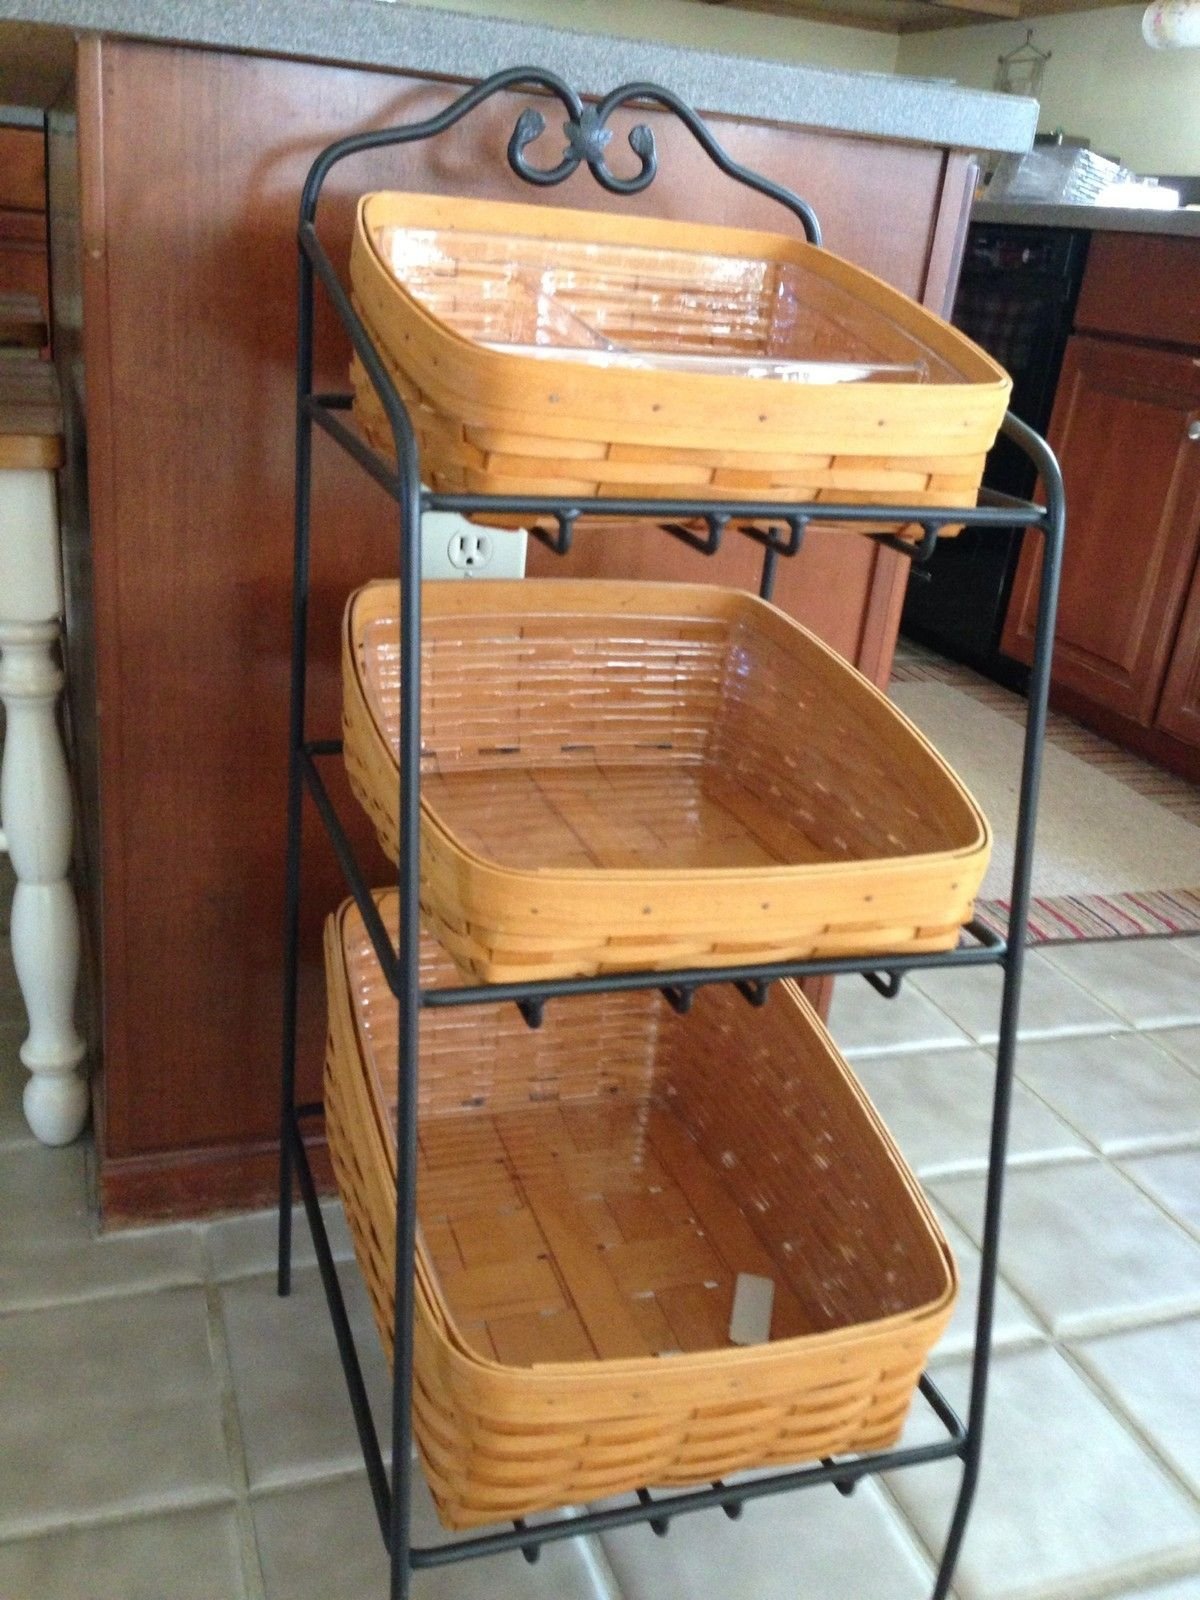 Longaberger Retired Wrought Iron Bin Stand With 3 Bin Baskets